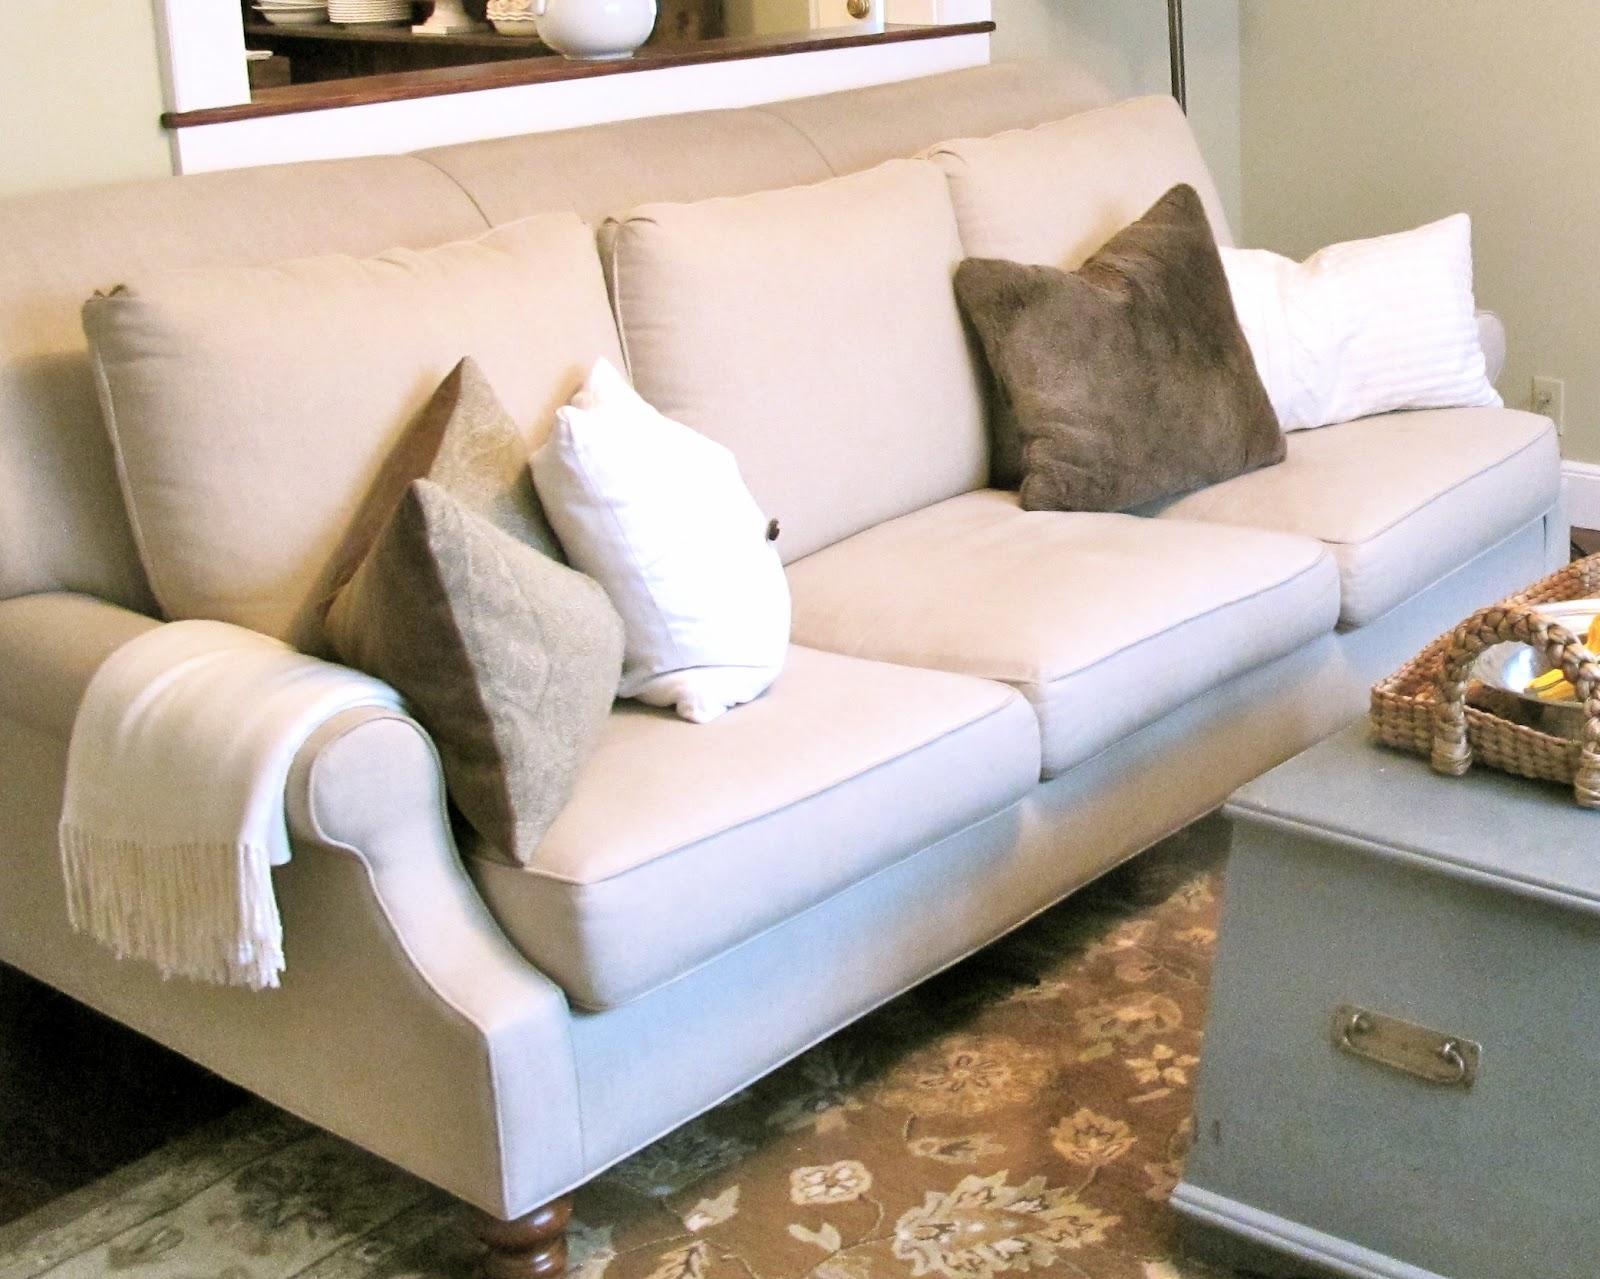 100 restoration hardware slipcover sofa fyi quick tips for